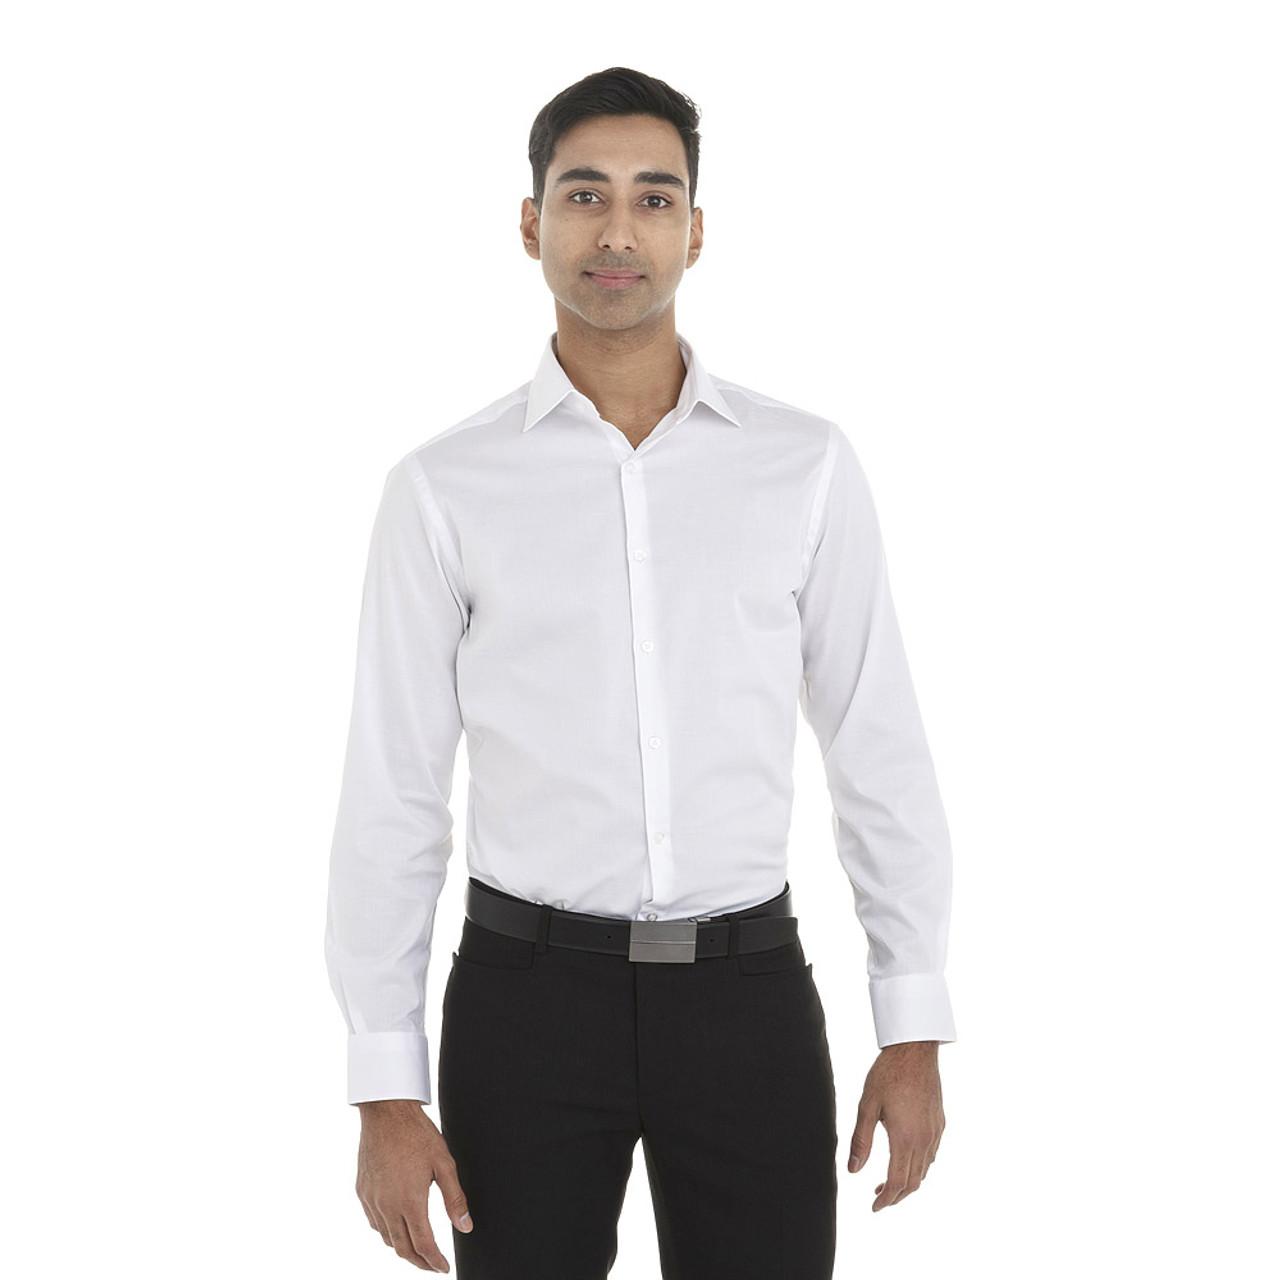 White - 18CV316 Van Heusen Long Sleeve Dress Twill Shirt   T-shirt.ca